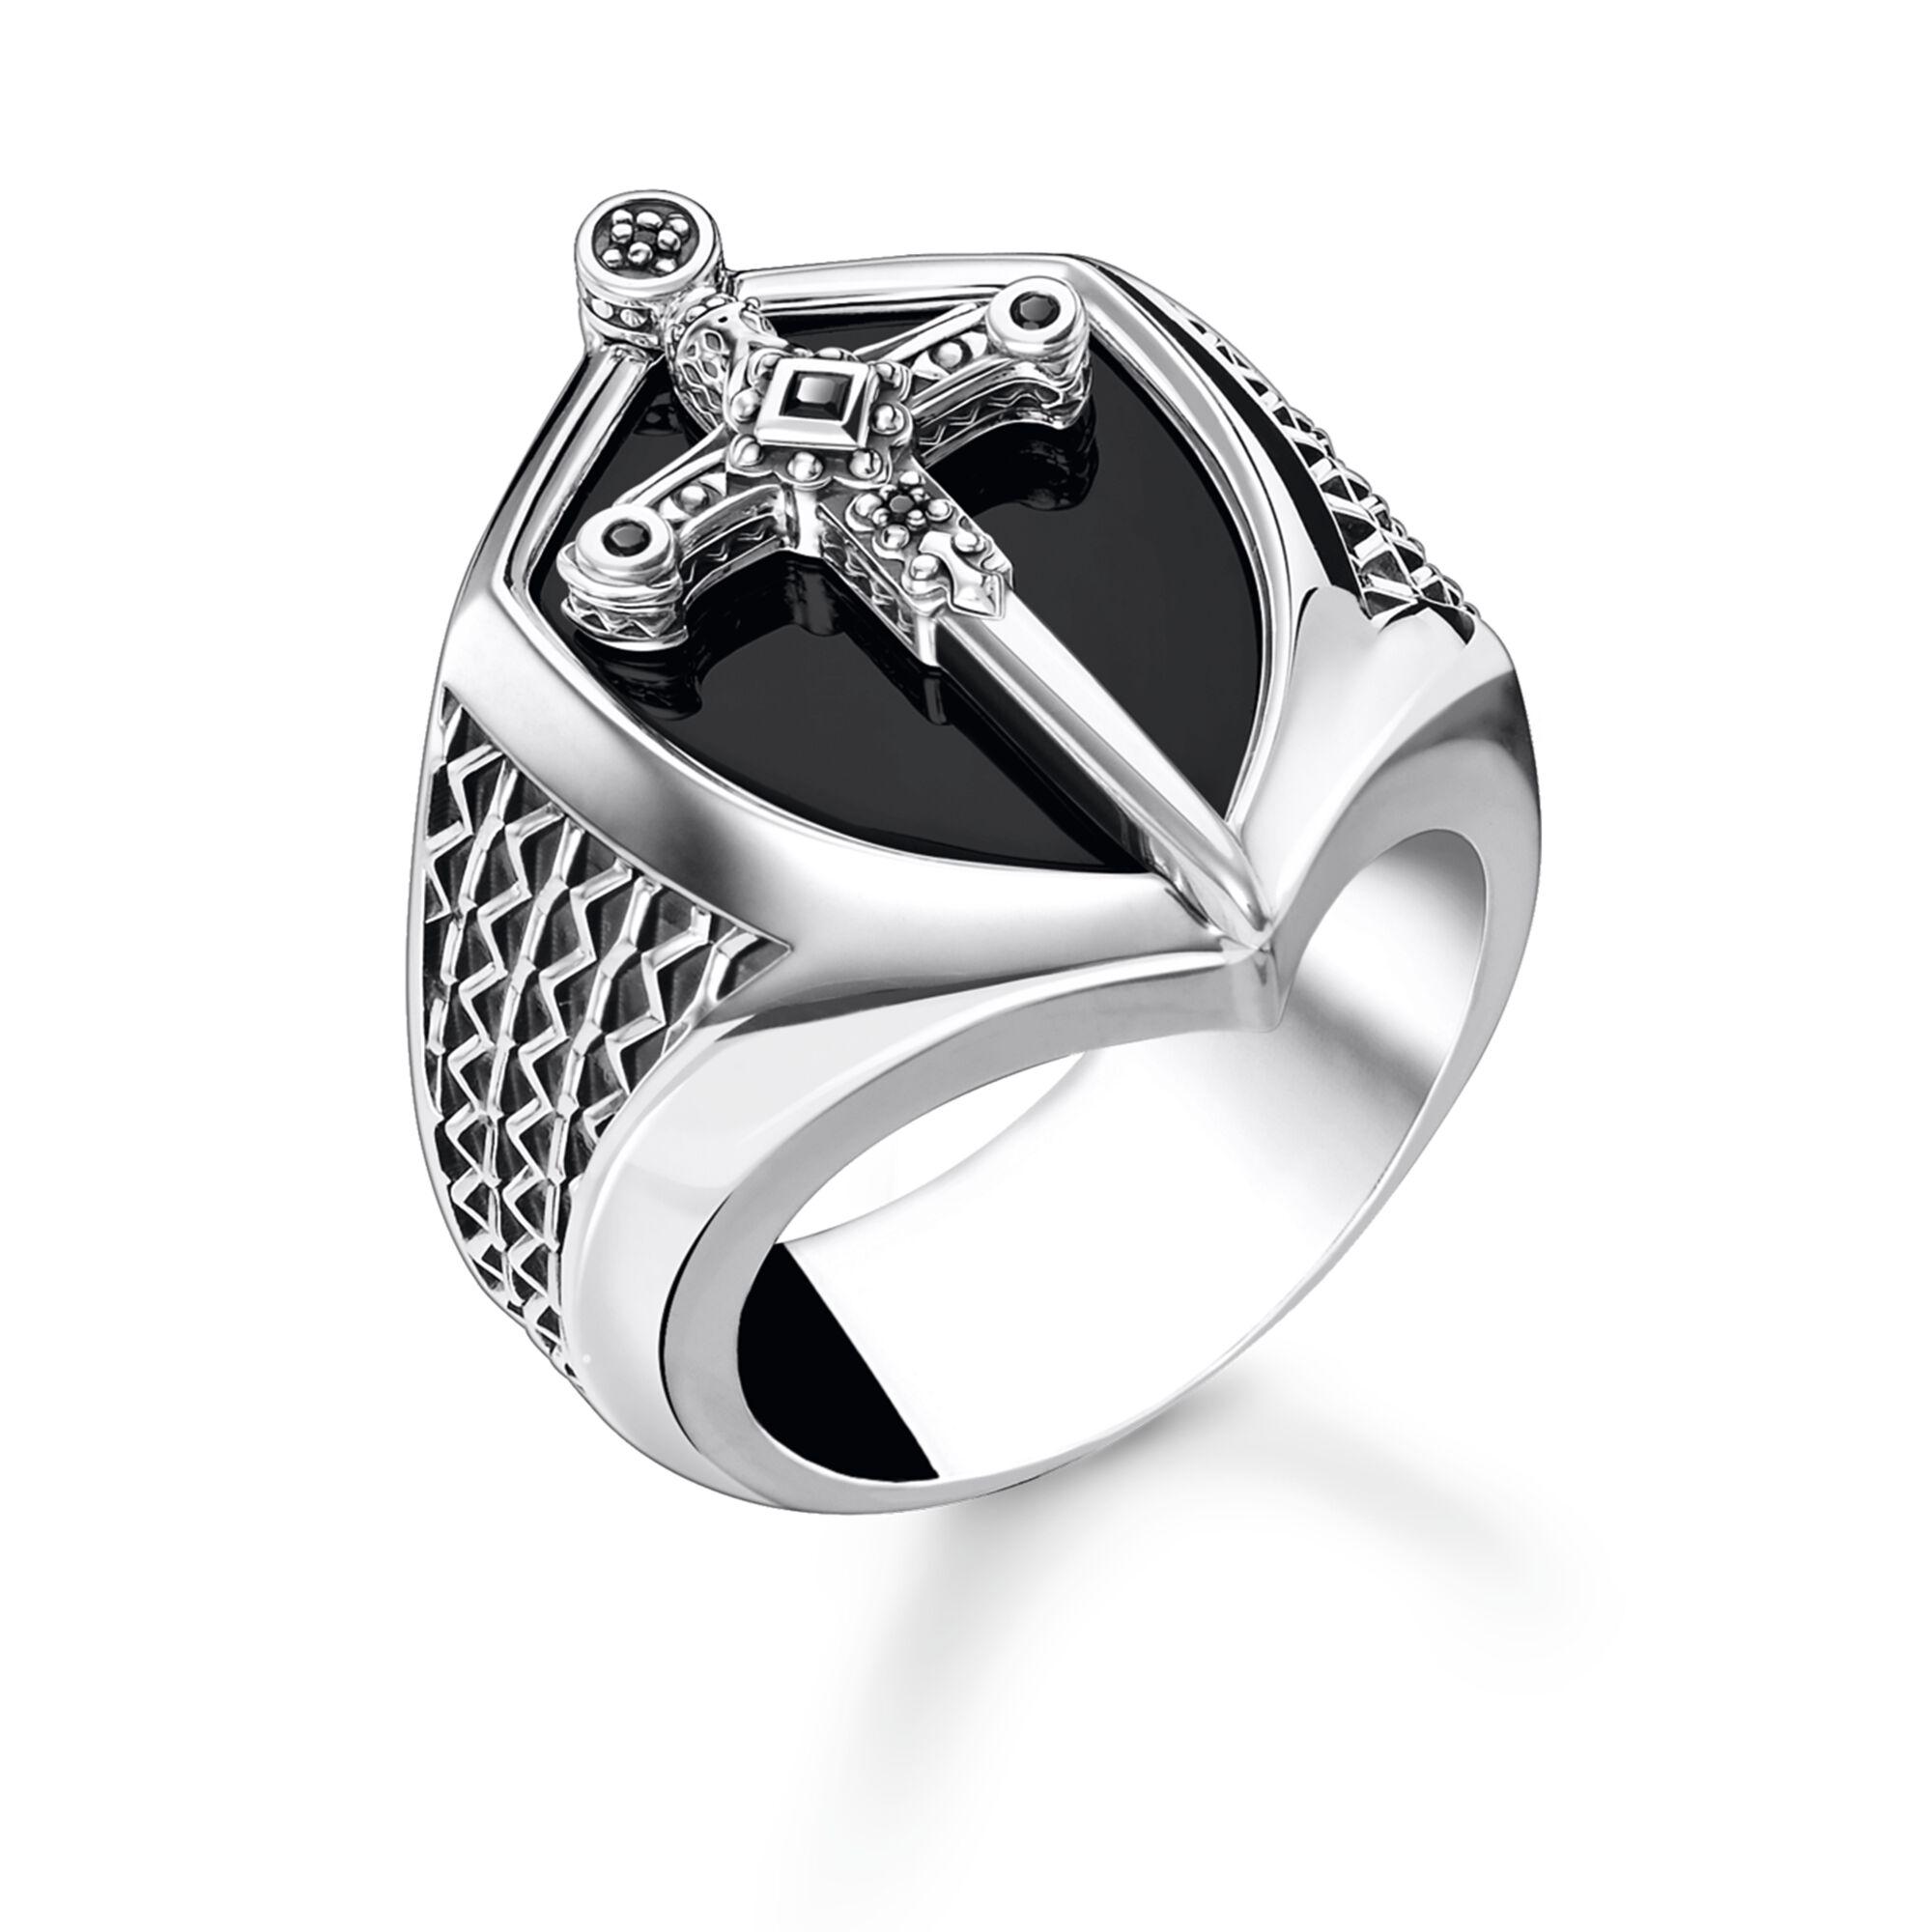 Wholesale Custom mens Black zirconia ring OEM/ODM Jewelry made of blackened 925 Sterling silver OEM jewelry factory